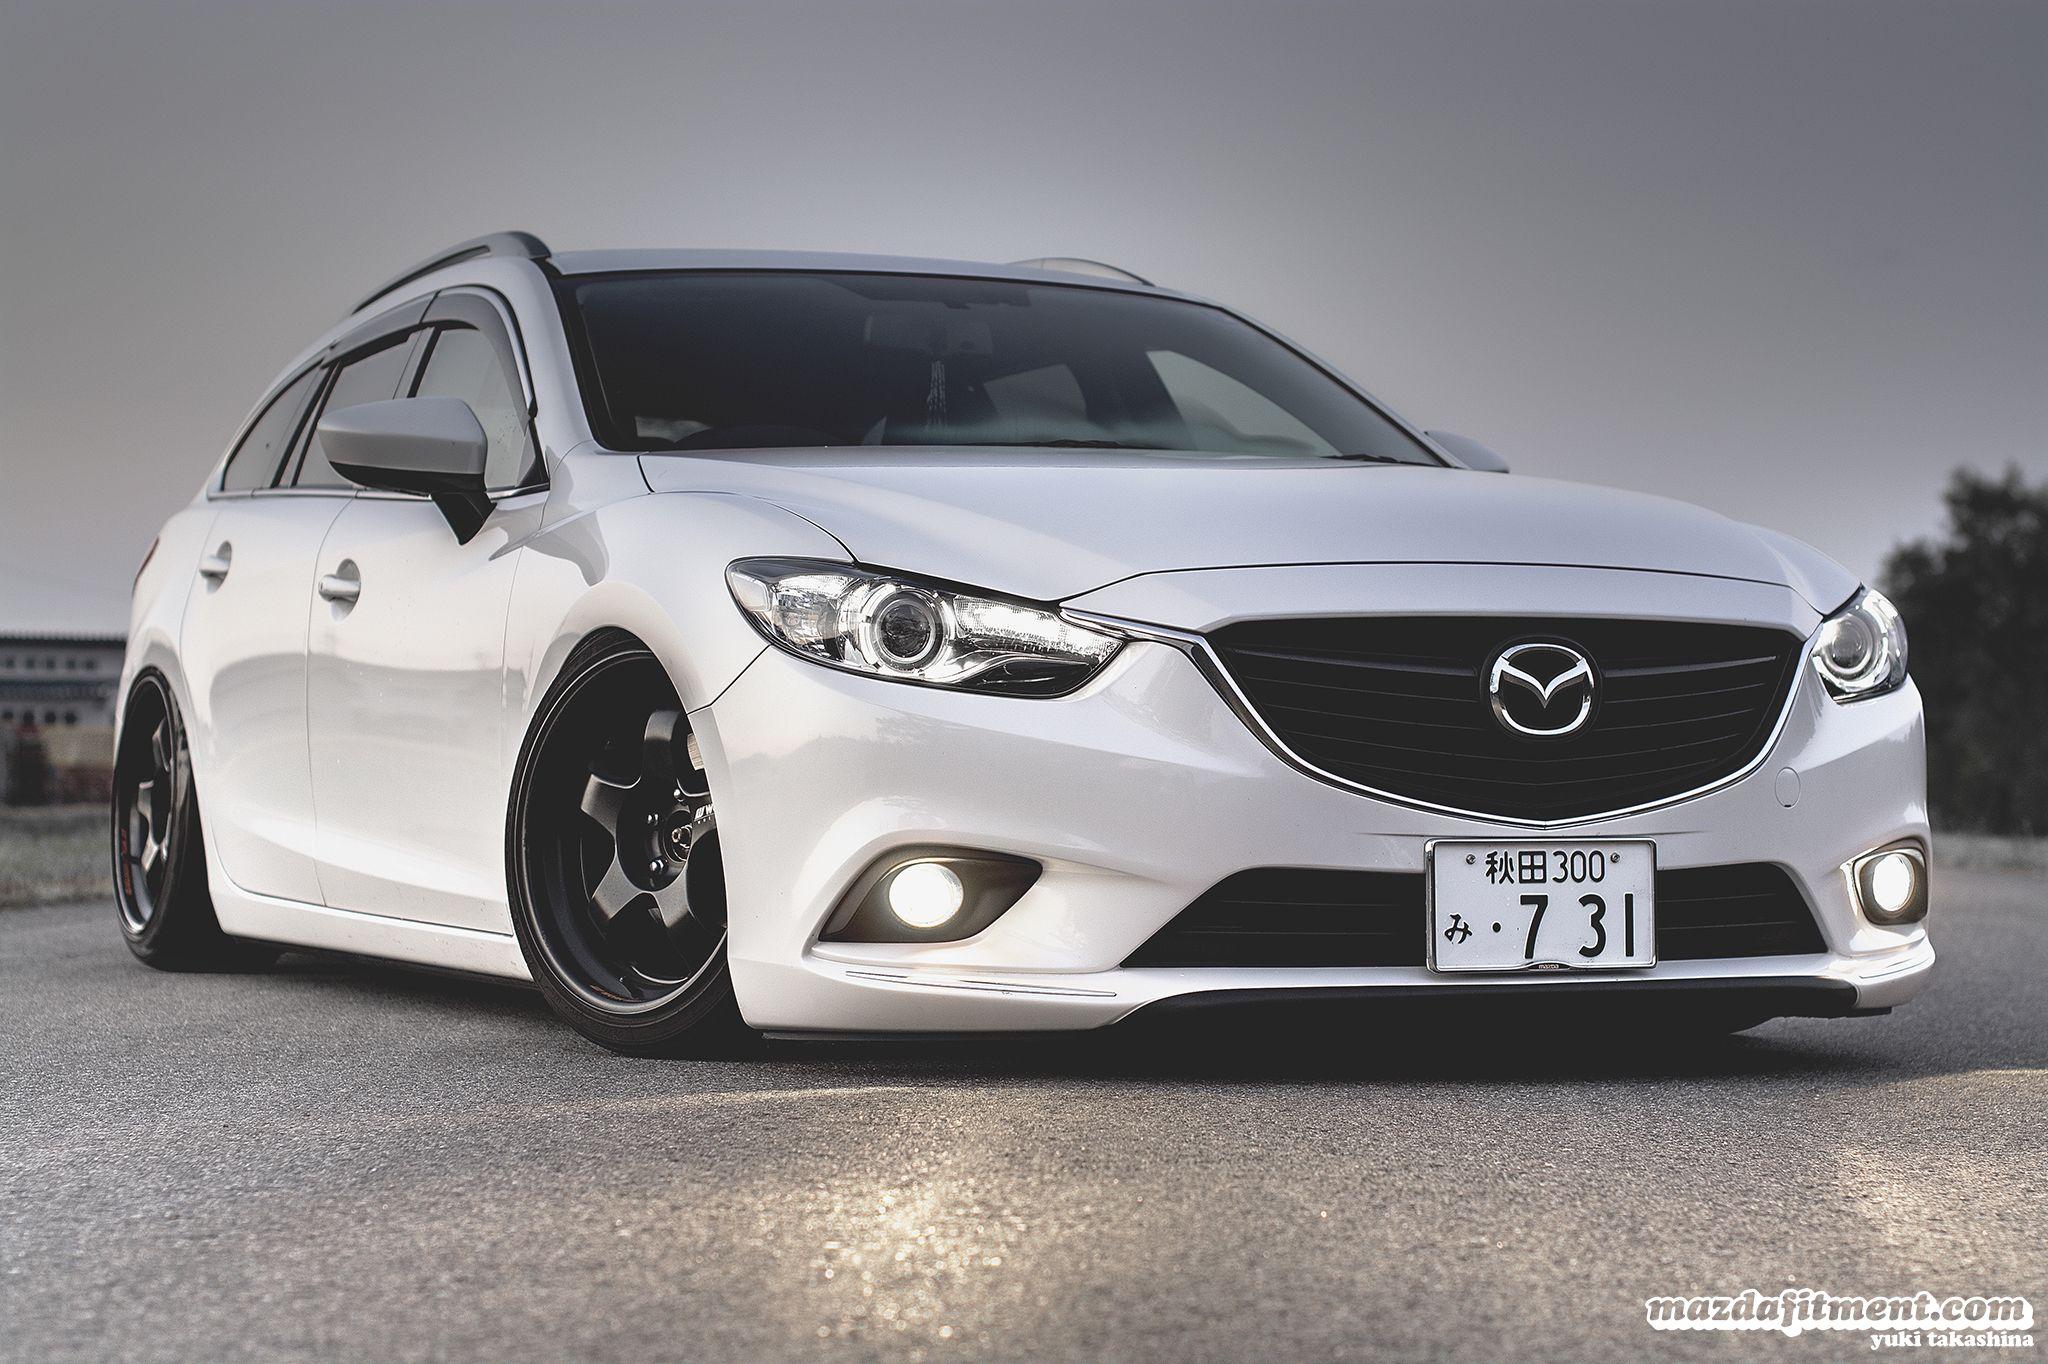 meister – Mazda Fitment | Mazda | Pinterest | Mazda, Cars ...